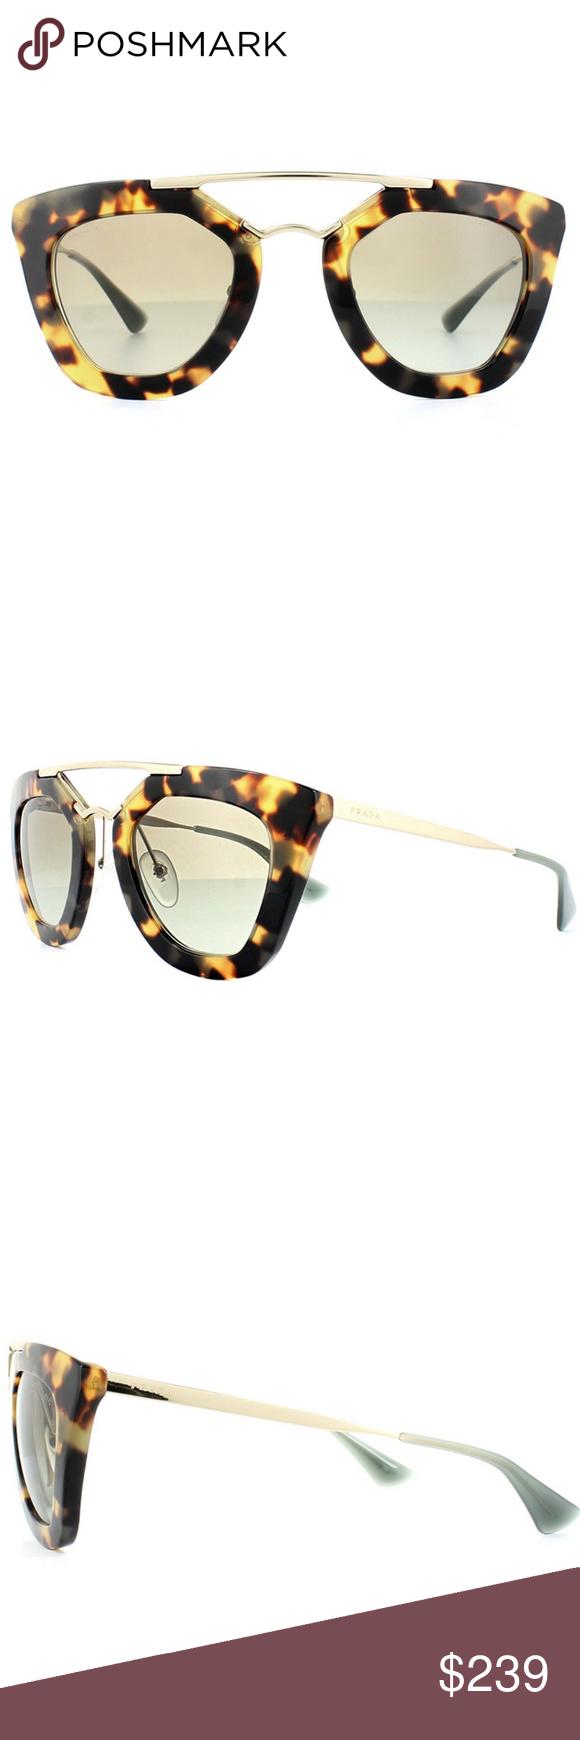 0b289b20f3 Prada Sunglasses Medium Havana w Green Prada Cat Eye Style Women s  Sunglasses 49mm Lens Size Having Medium Havana Color Plastic   Metal Frame with  Green ...